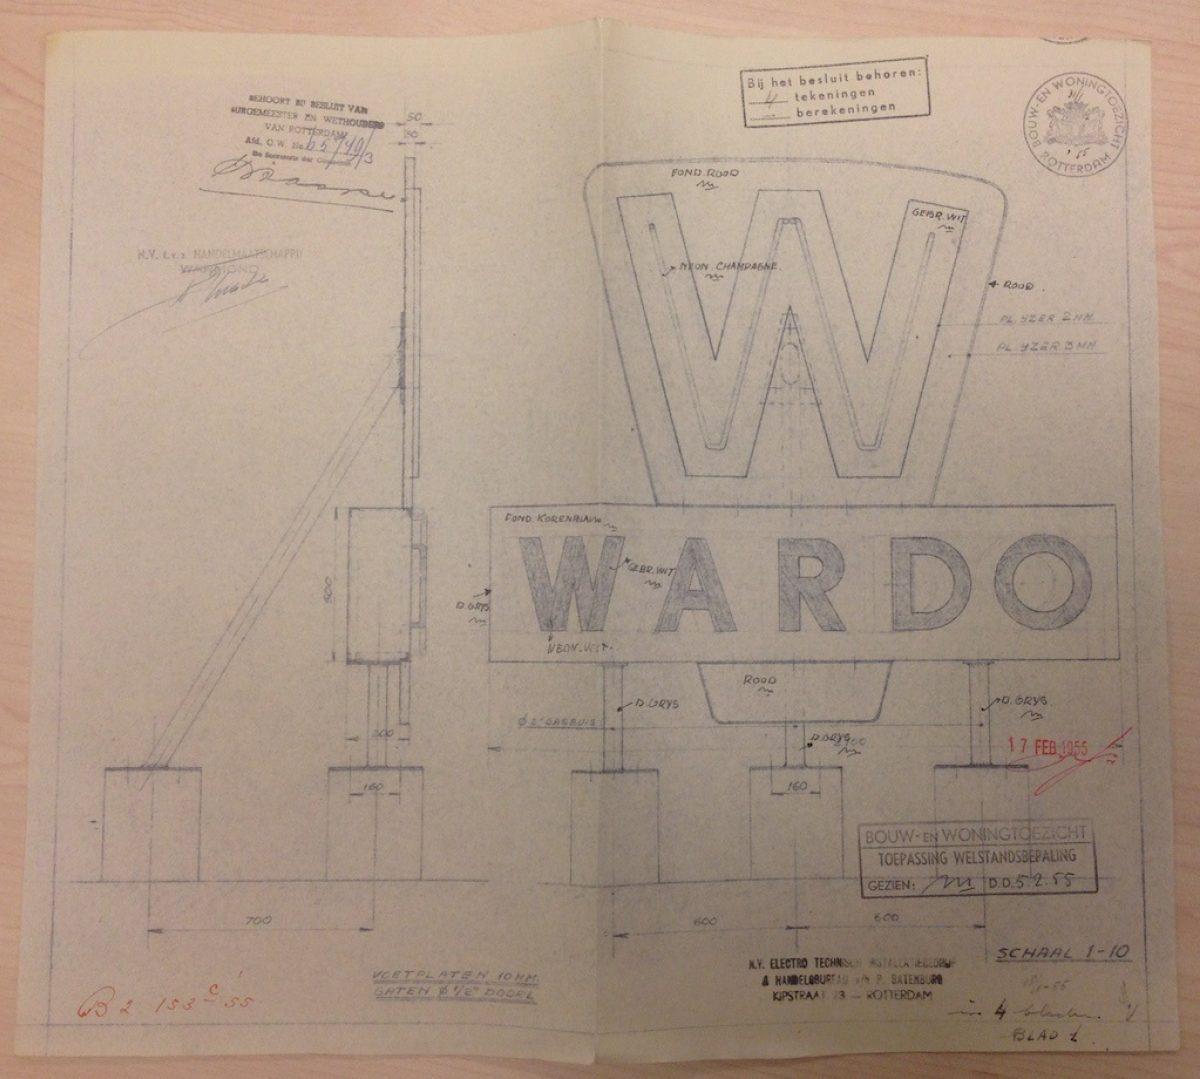 Delftsestraat Stadsarchief Warmond Wardo